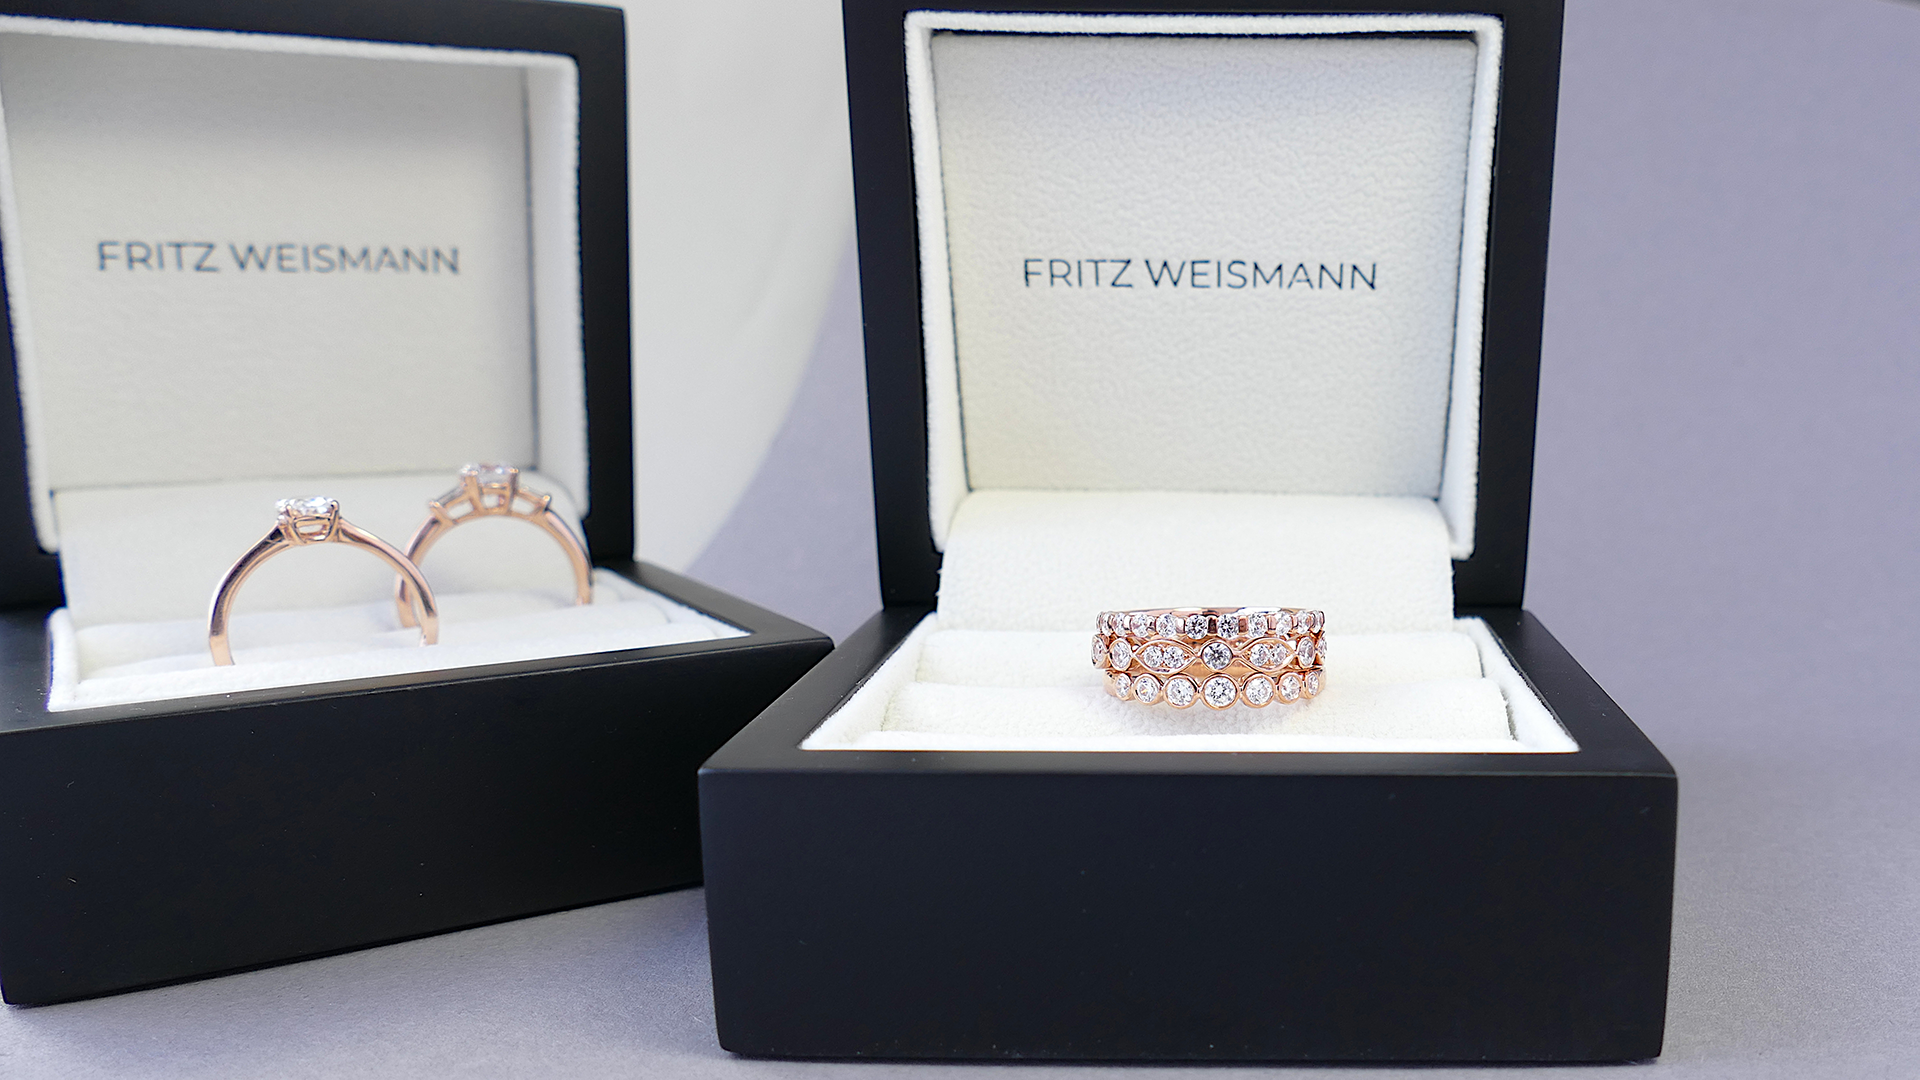 Fritz Weismann Fine Jewellery - Ice-Wedding.at 1